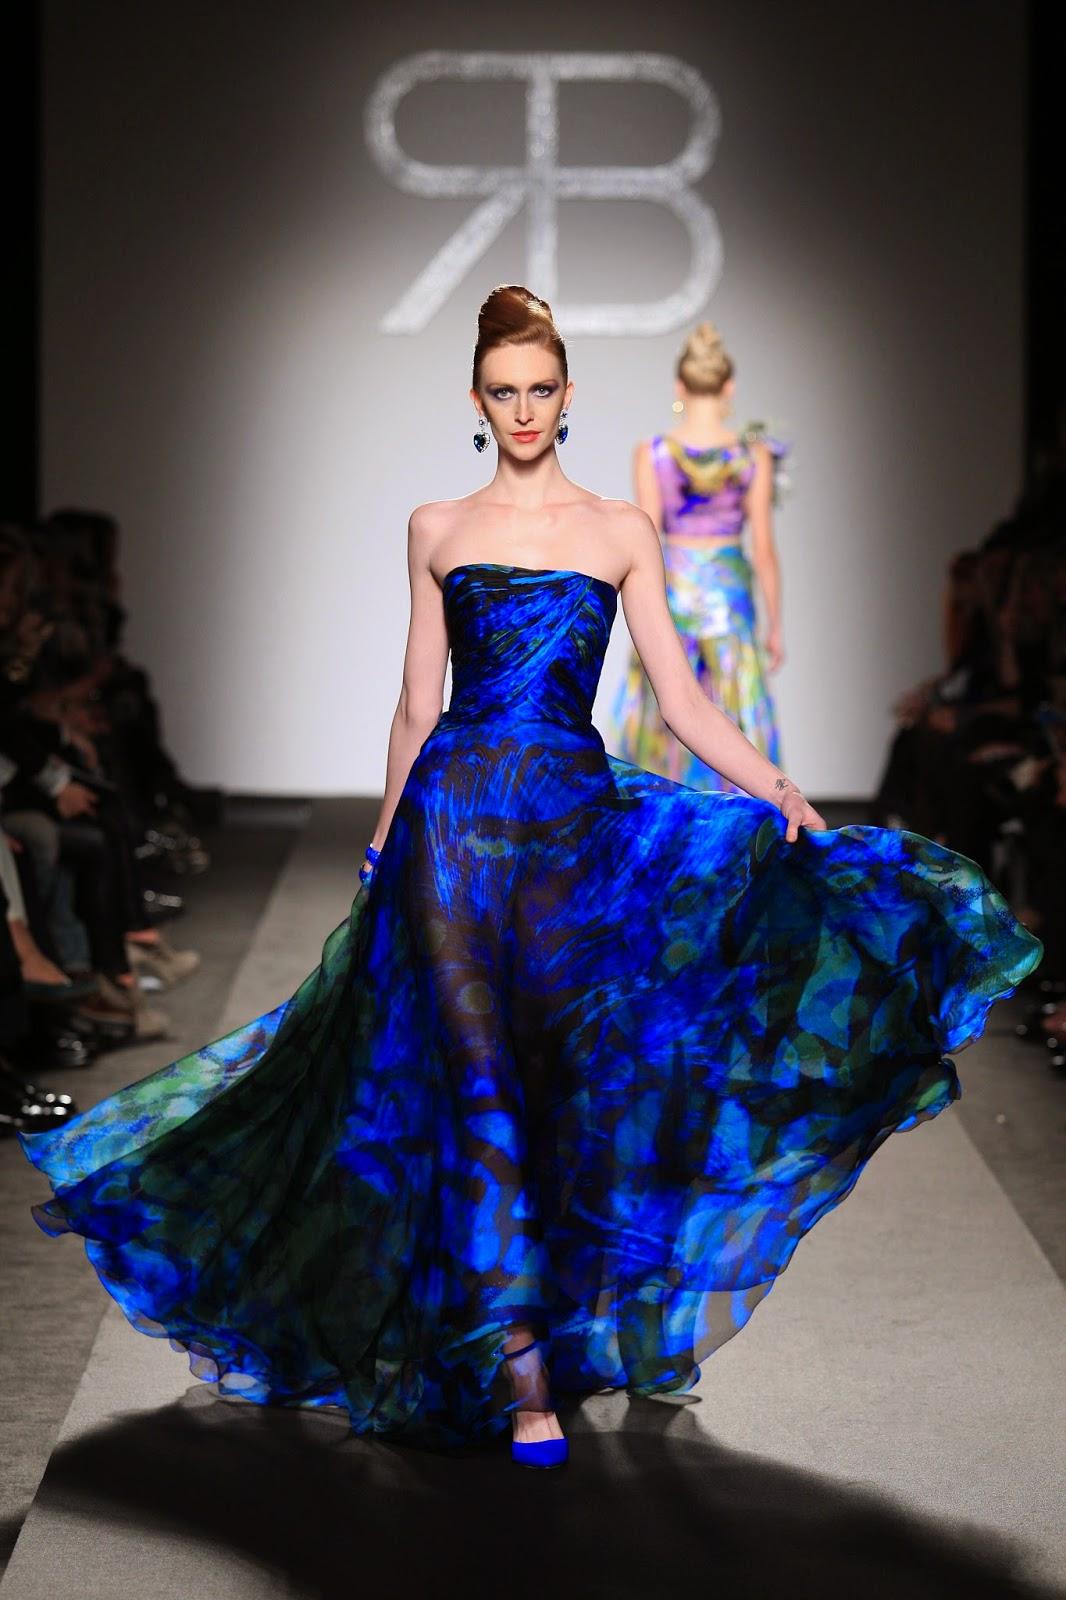 Balestra, Renato Balestra, Blu Balestra, themorasmoothie, fashion, sfilate, fashion show, fashionblog, fashionblogger, shopping, dress, shoes, model, S/S 2014